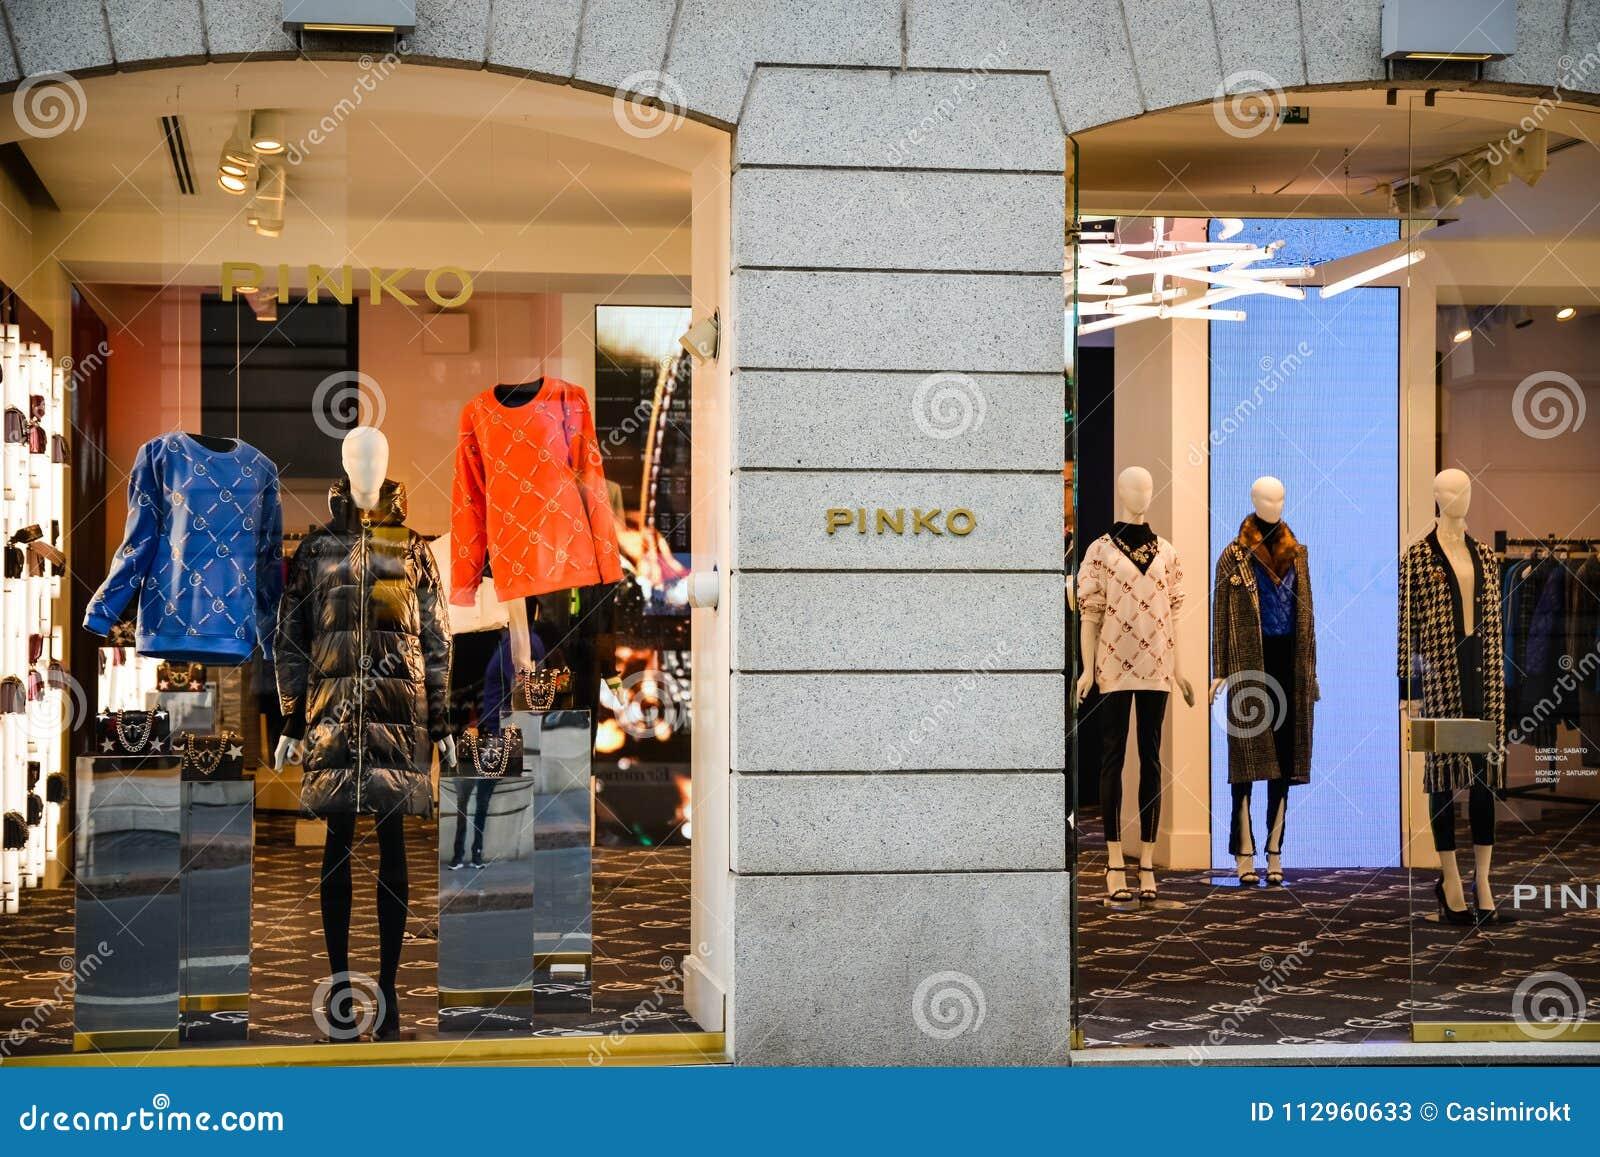 official photos 6d12f 402a8 Milan, Italy - September 24, 2017: Pinko Store In Milan ...